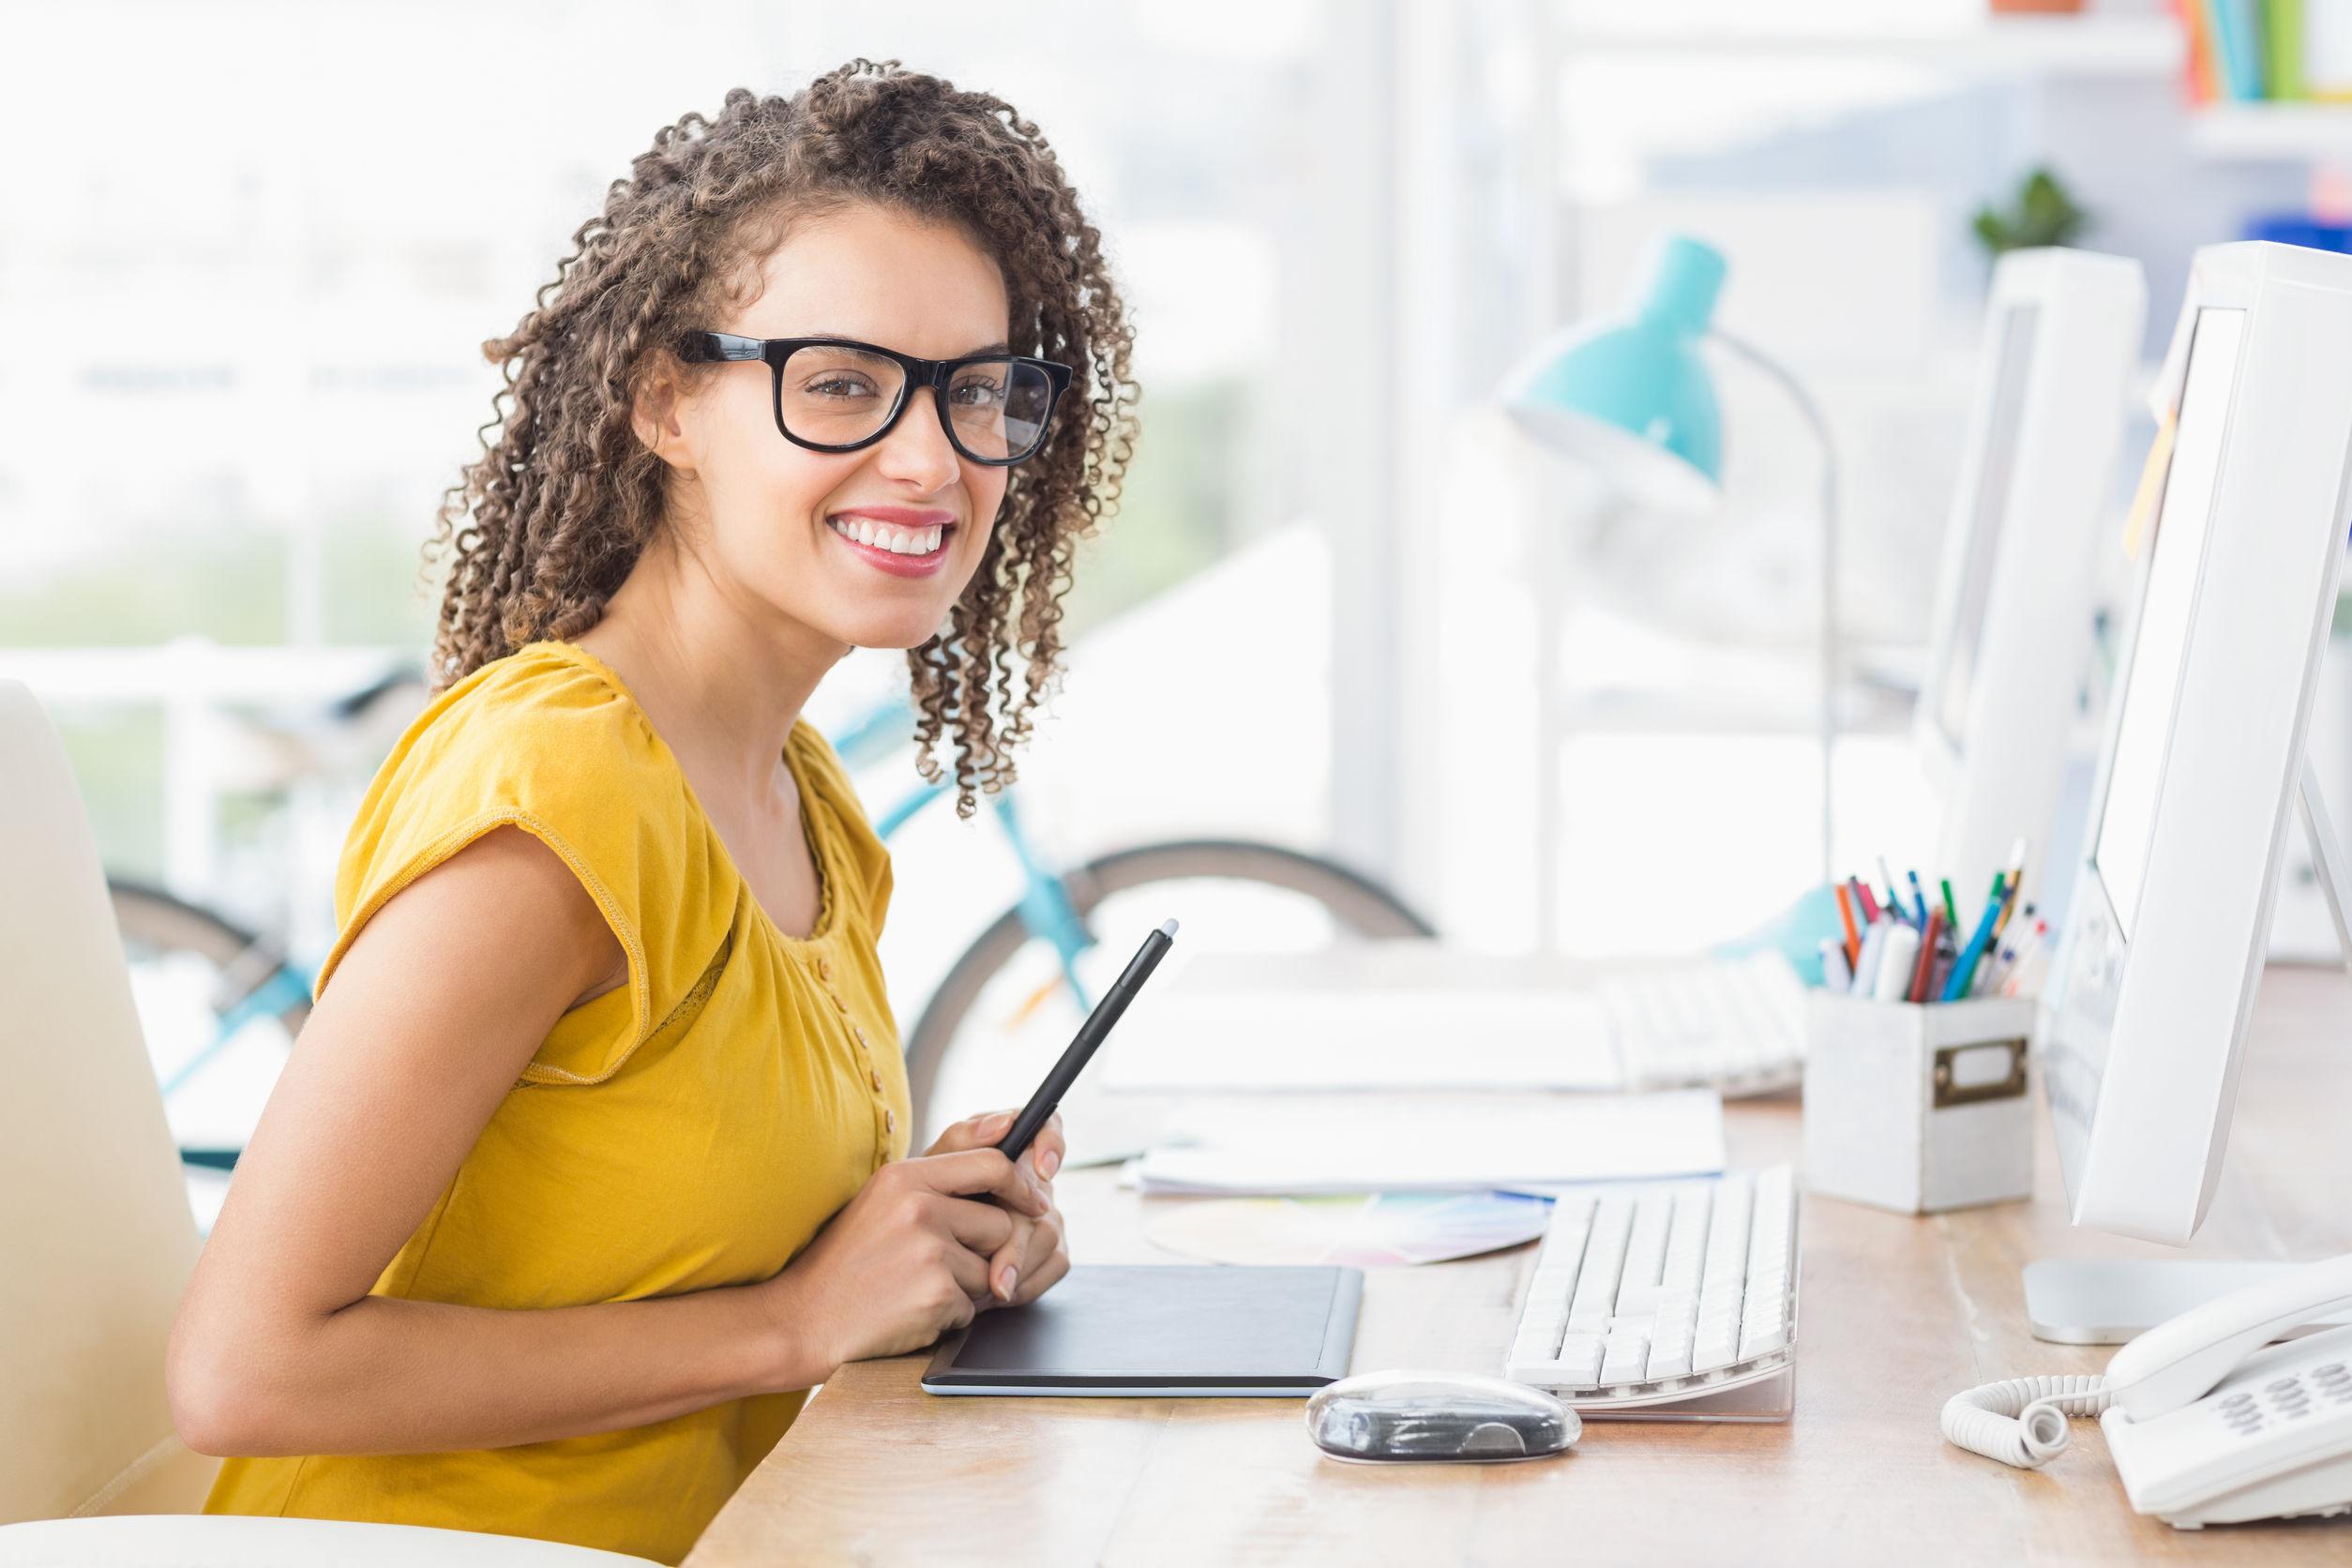 Female Creative Director at desk